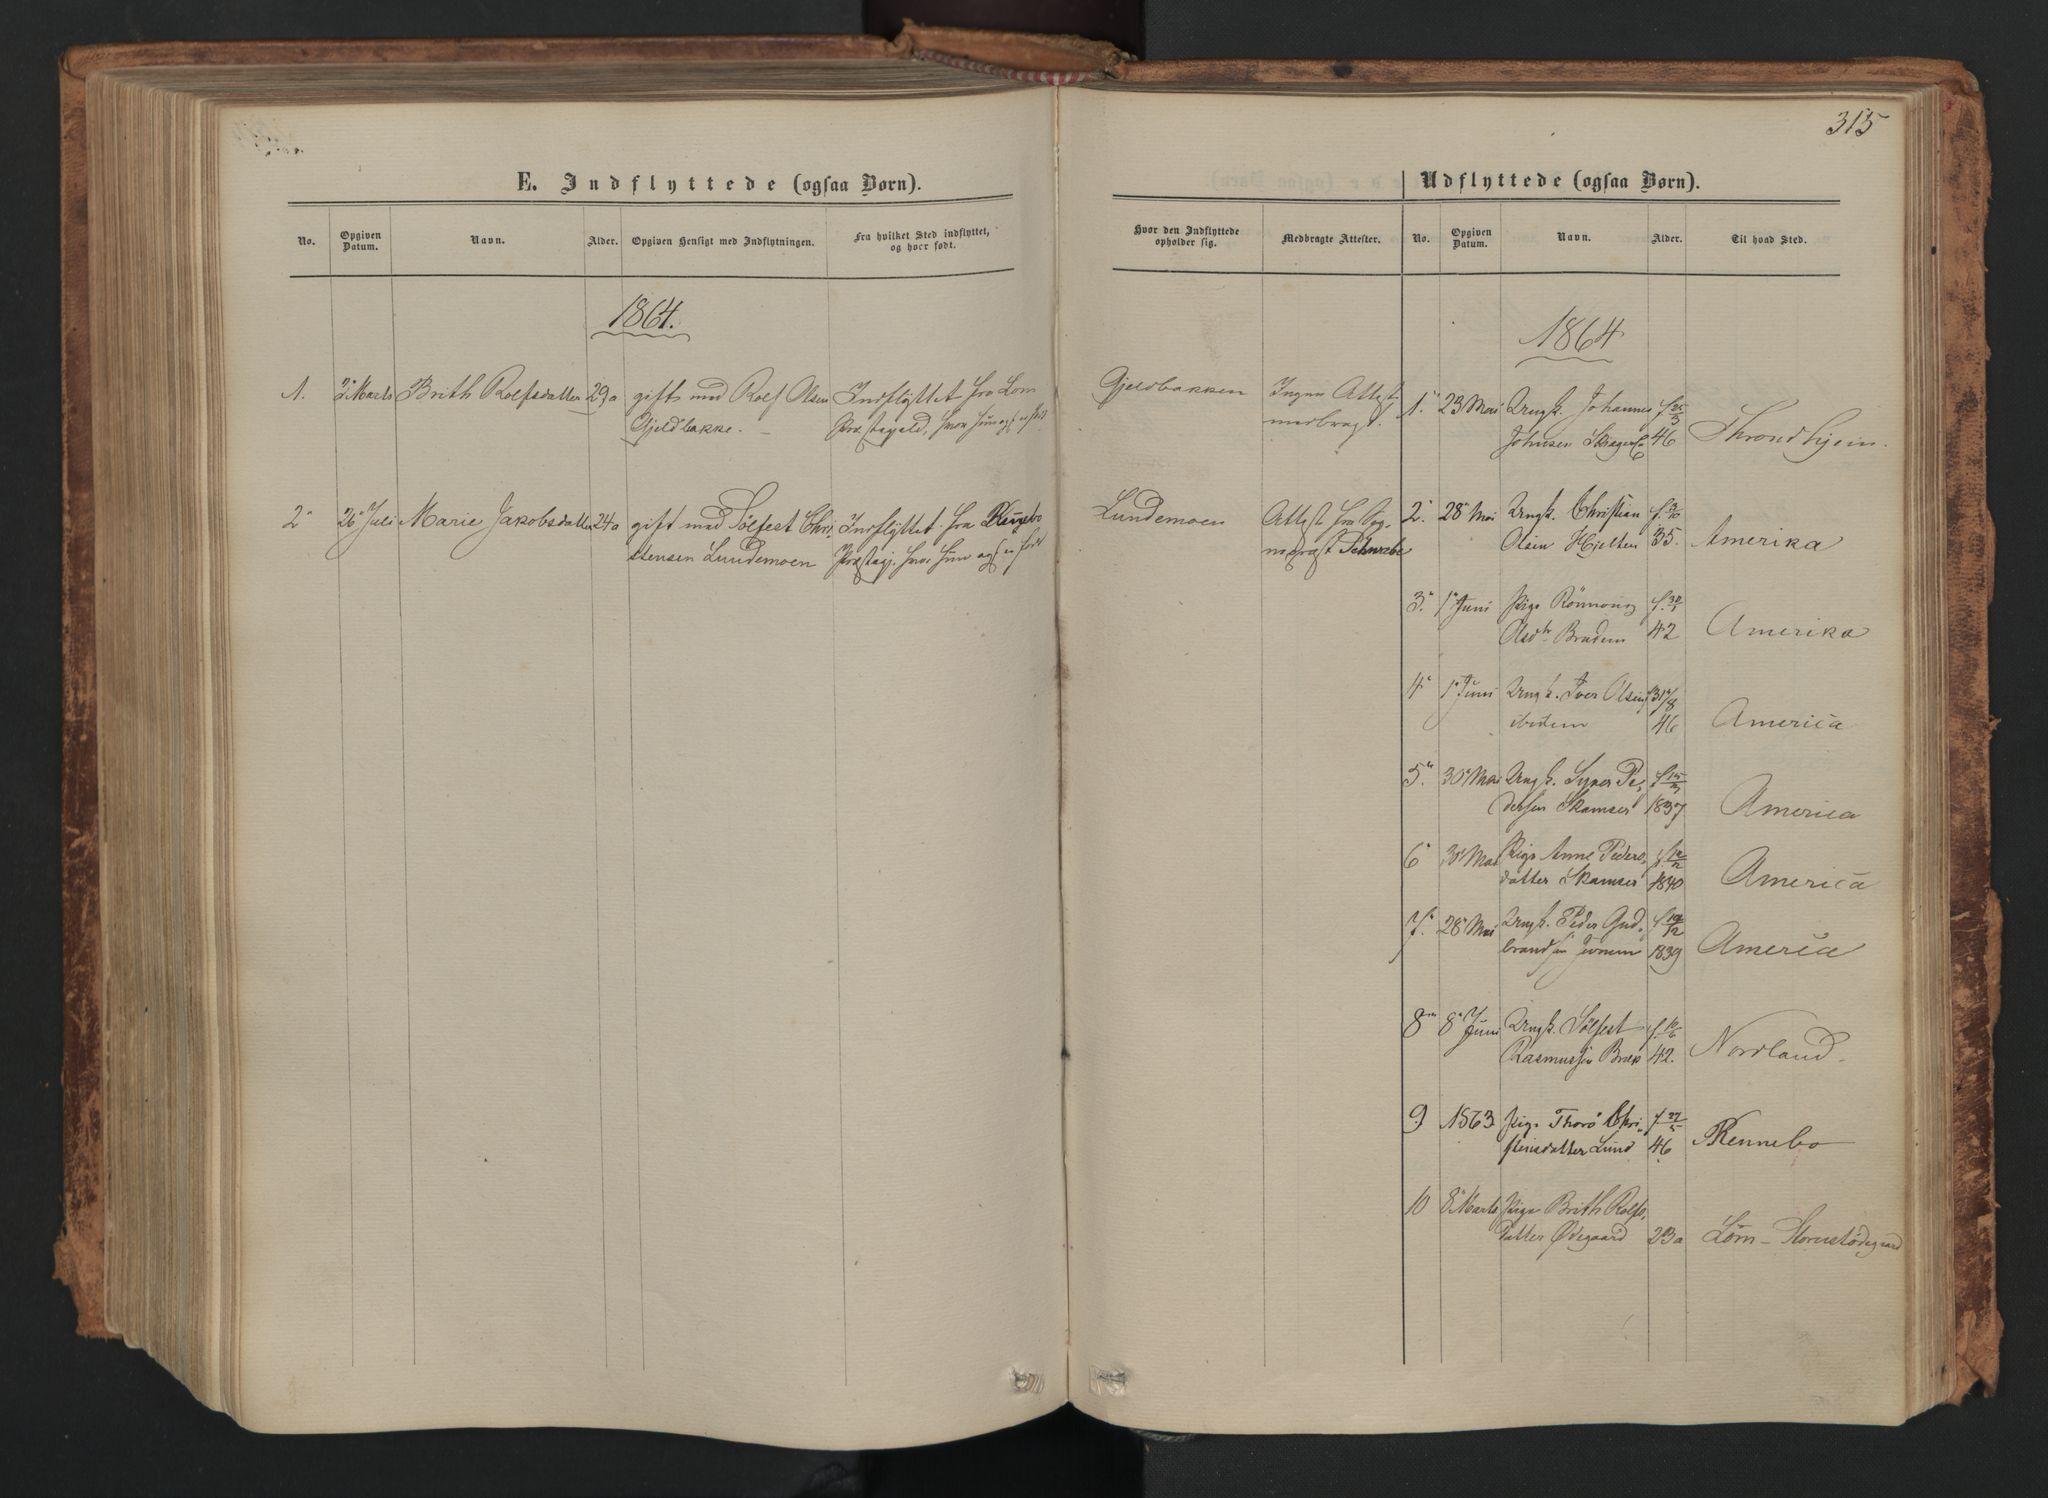 SAH, Skjåk prestekontor, Ministerialbok nr. 1, 1863-1879, s. 315